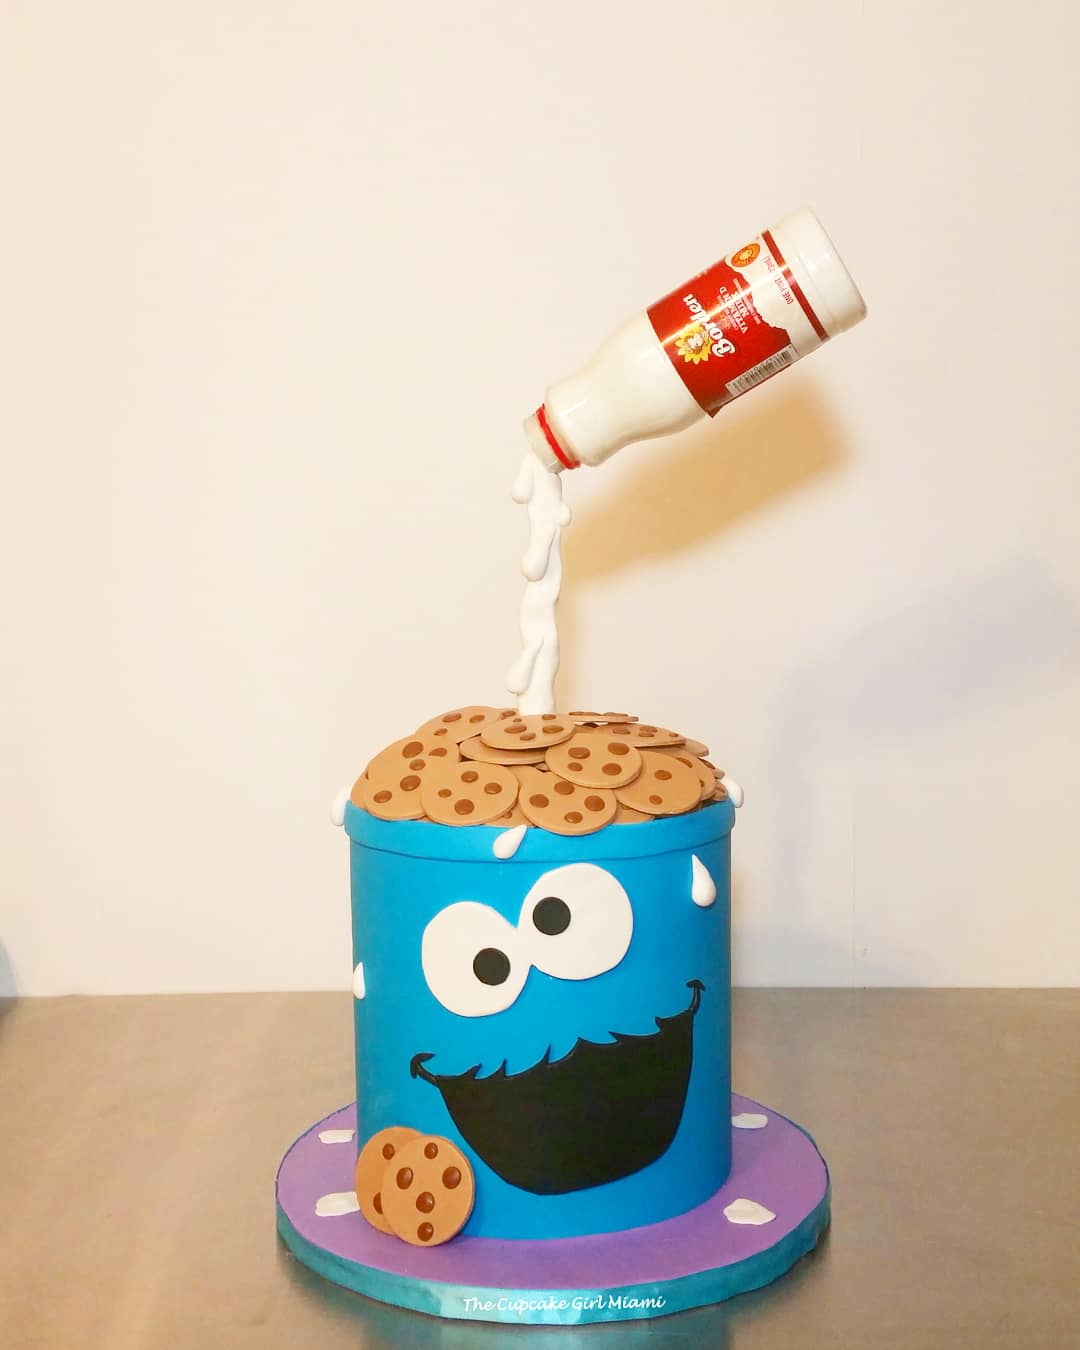 Peachy Birthday Cakes Wedding Cakes Baby Shower Cakes The Cupcake Funny Birthday Cards Online Hendilapandamsfinfo